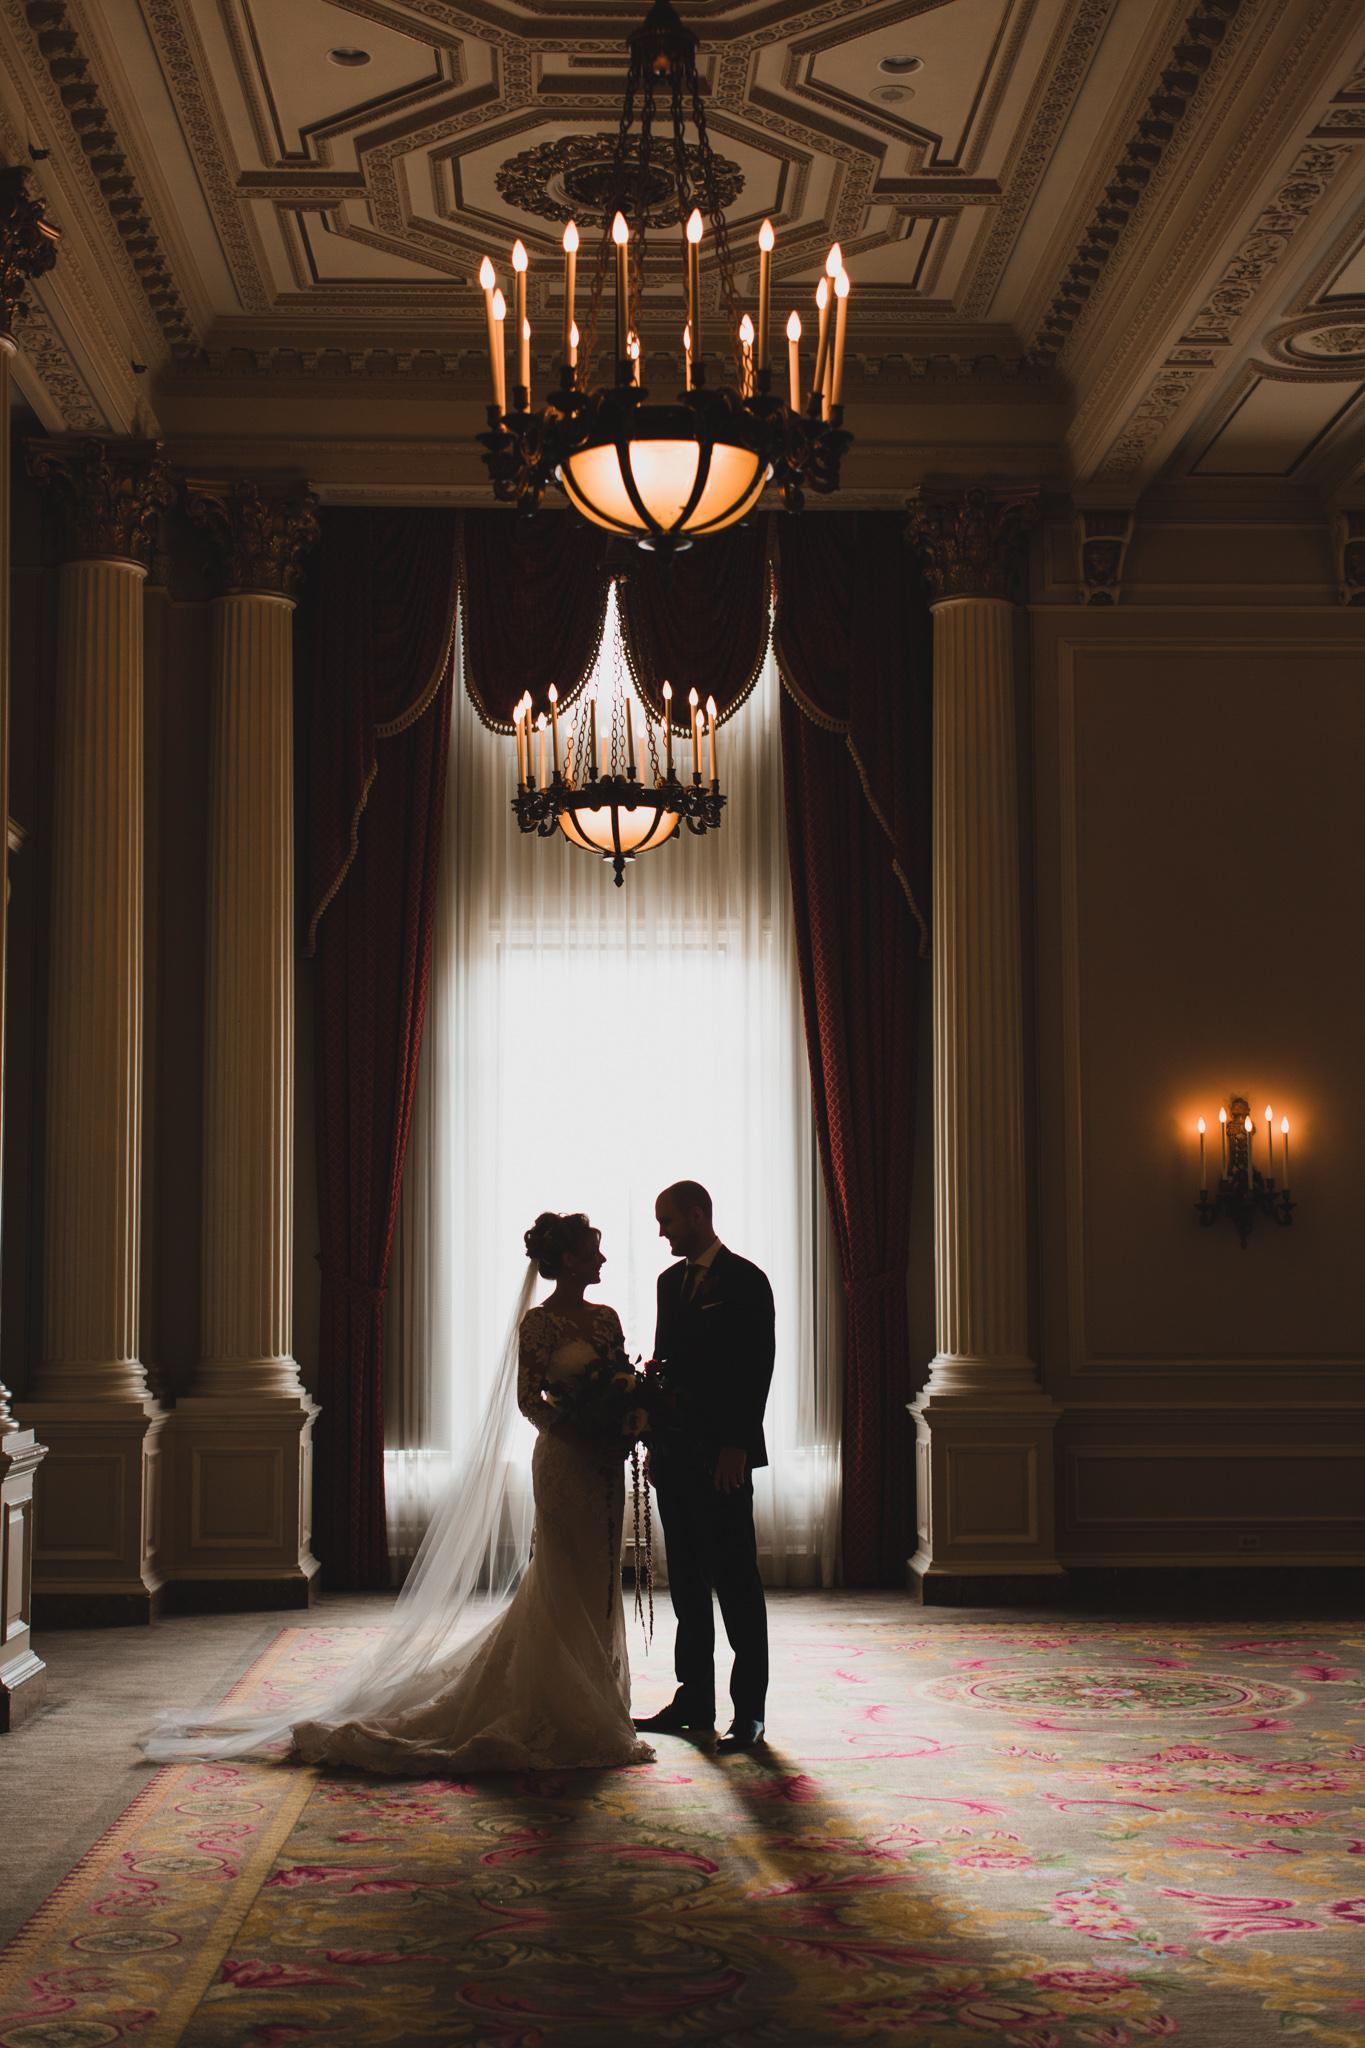 Alternative, moody wedding photographer Ottawa